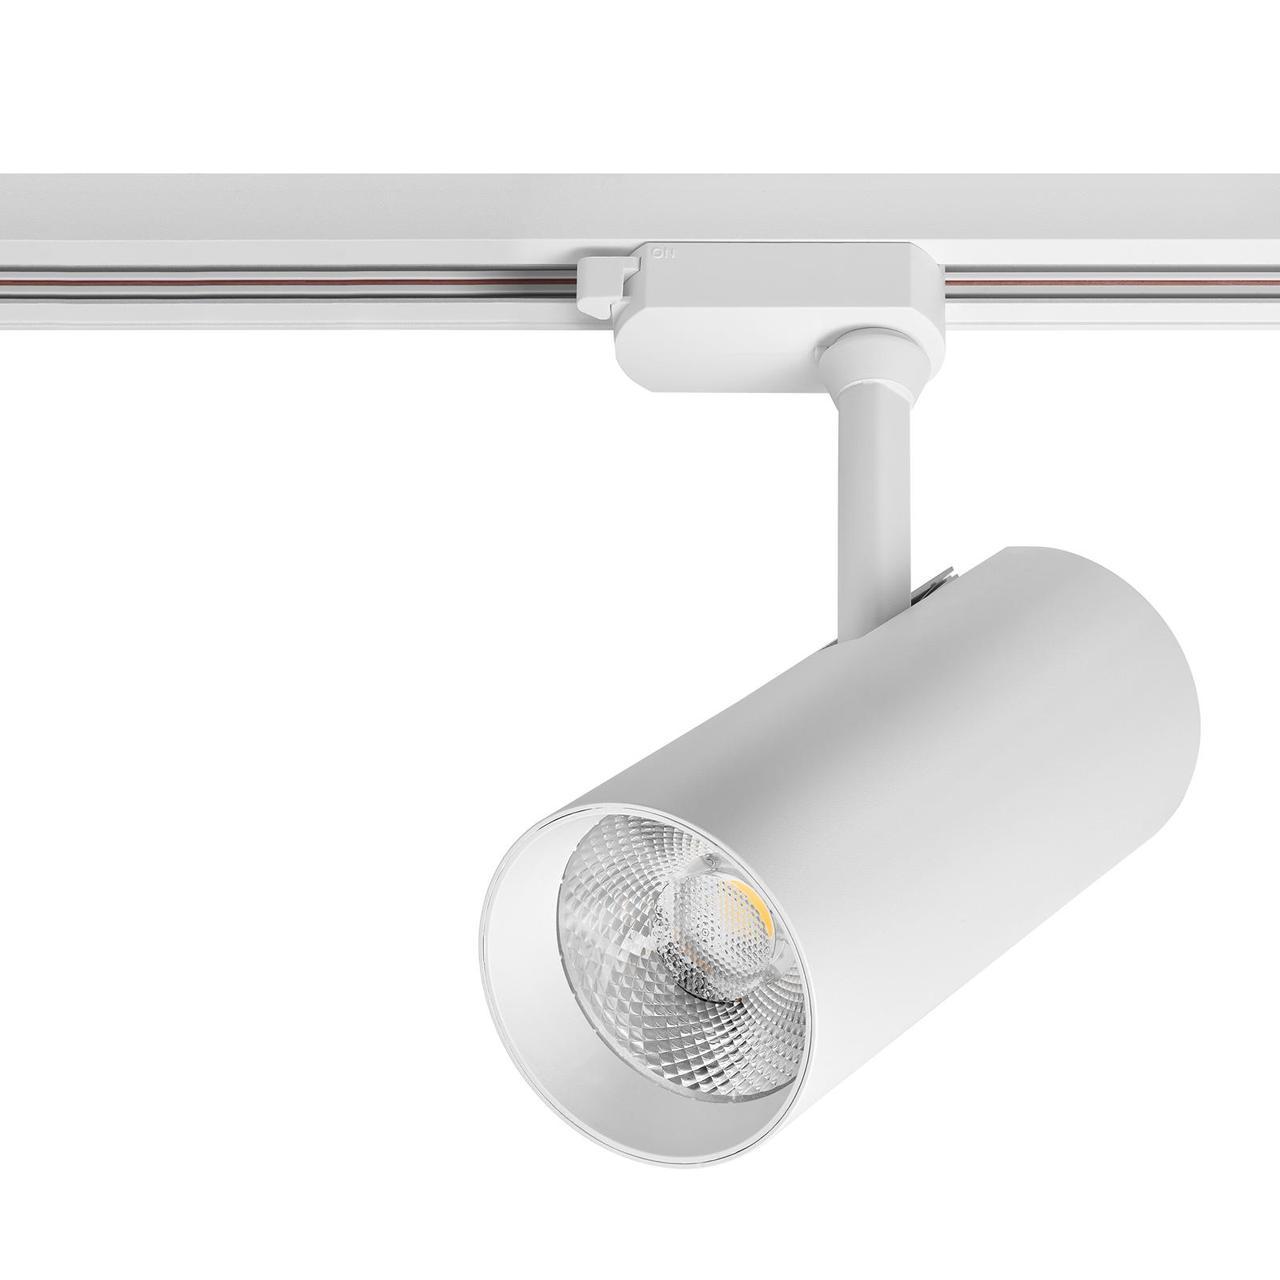 Лед прожектор трековый DELUX TL04 30 Вт  36°  4000K  белый